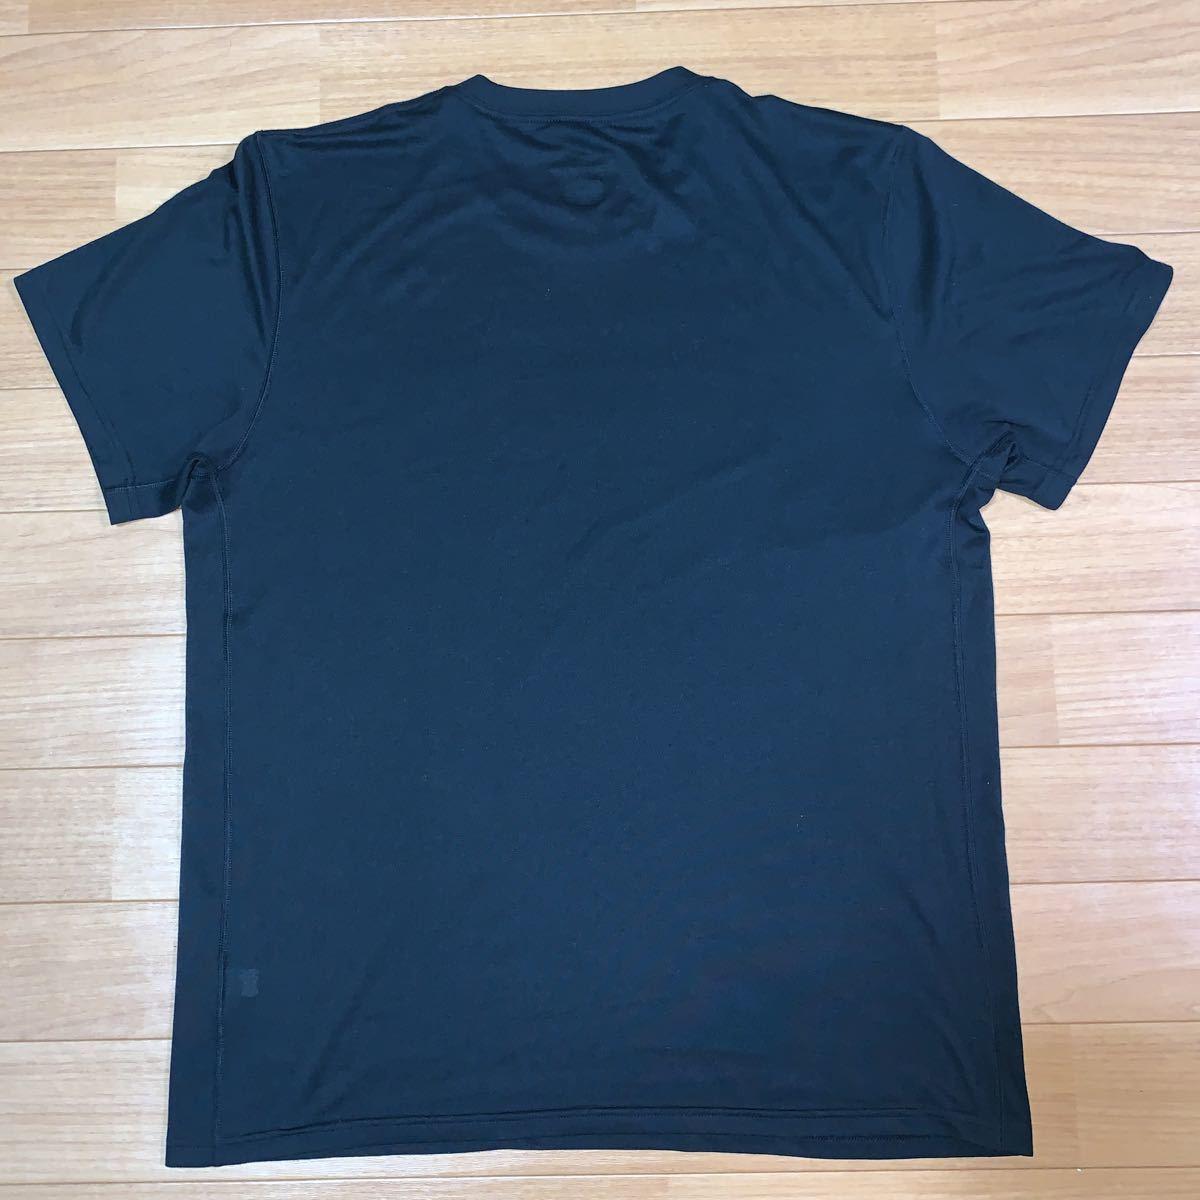 Nike DRY FIT ナイキ ドライフィット 半袖 XXL ブラック XL 2XL 速乾 ドライ Tシャツ NIKE 半袖Tシャツ 黒_画像7